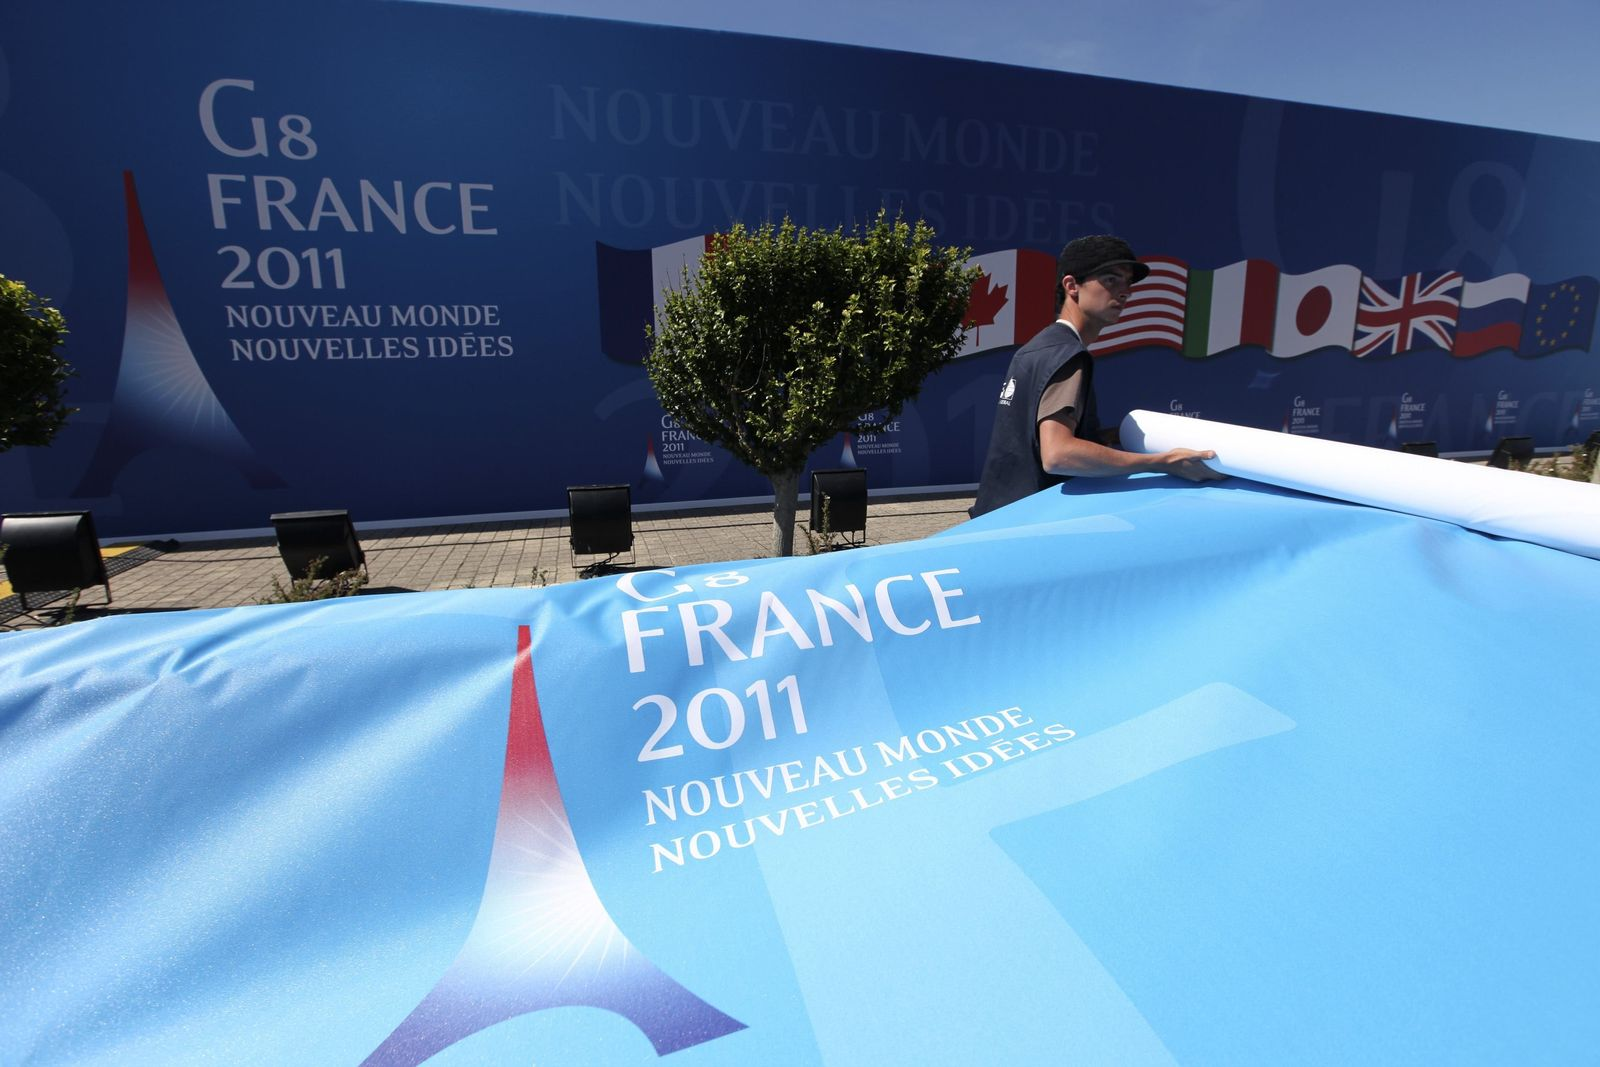 G8-Gipfel / Deauville